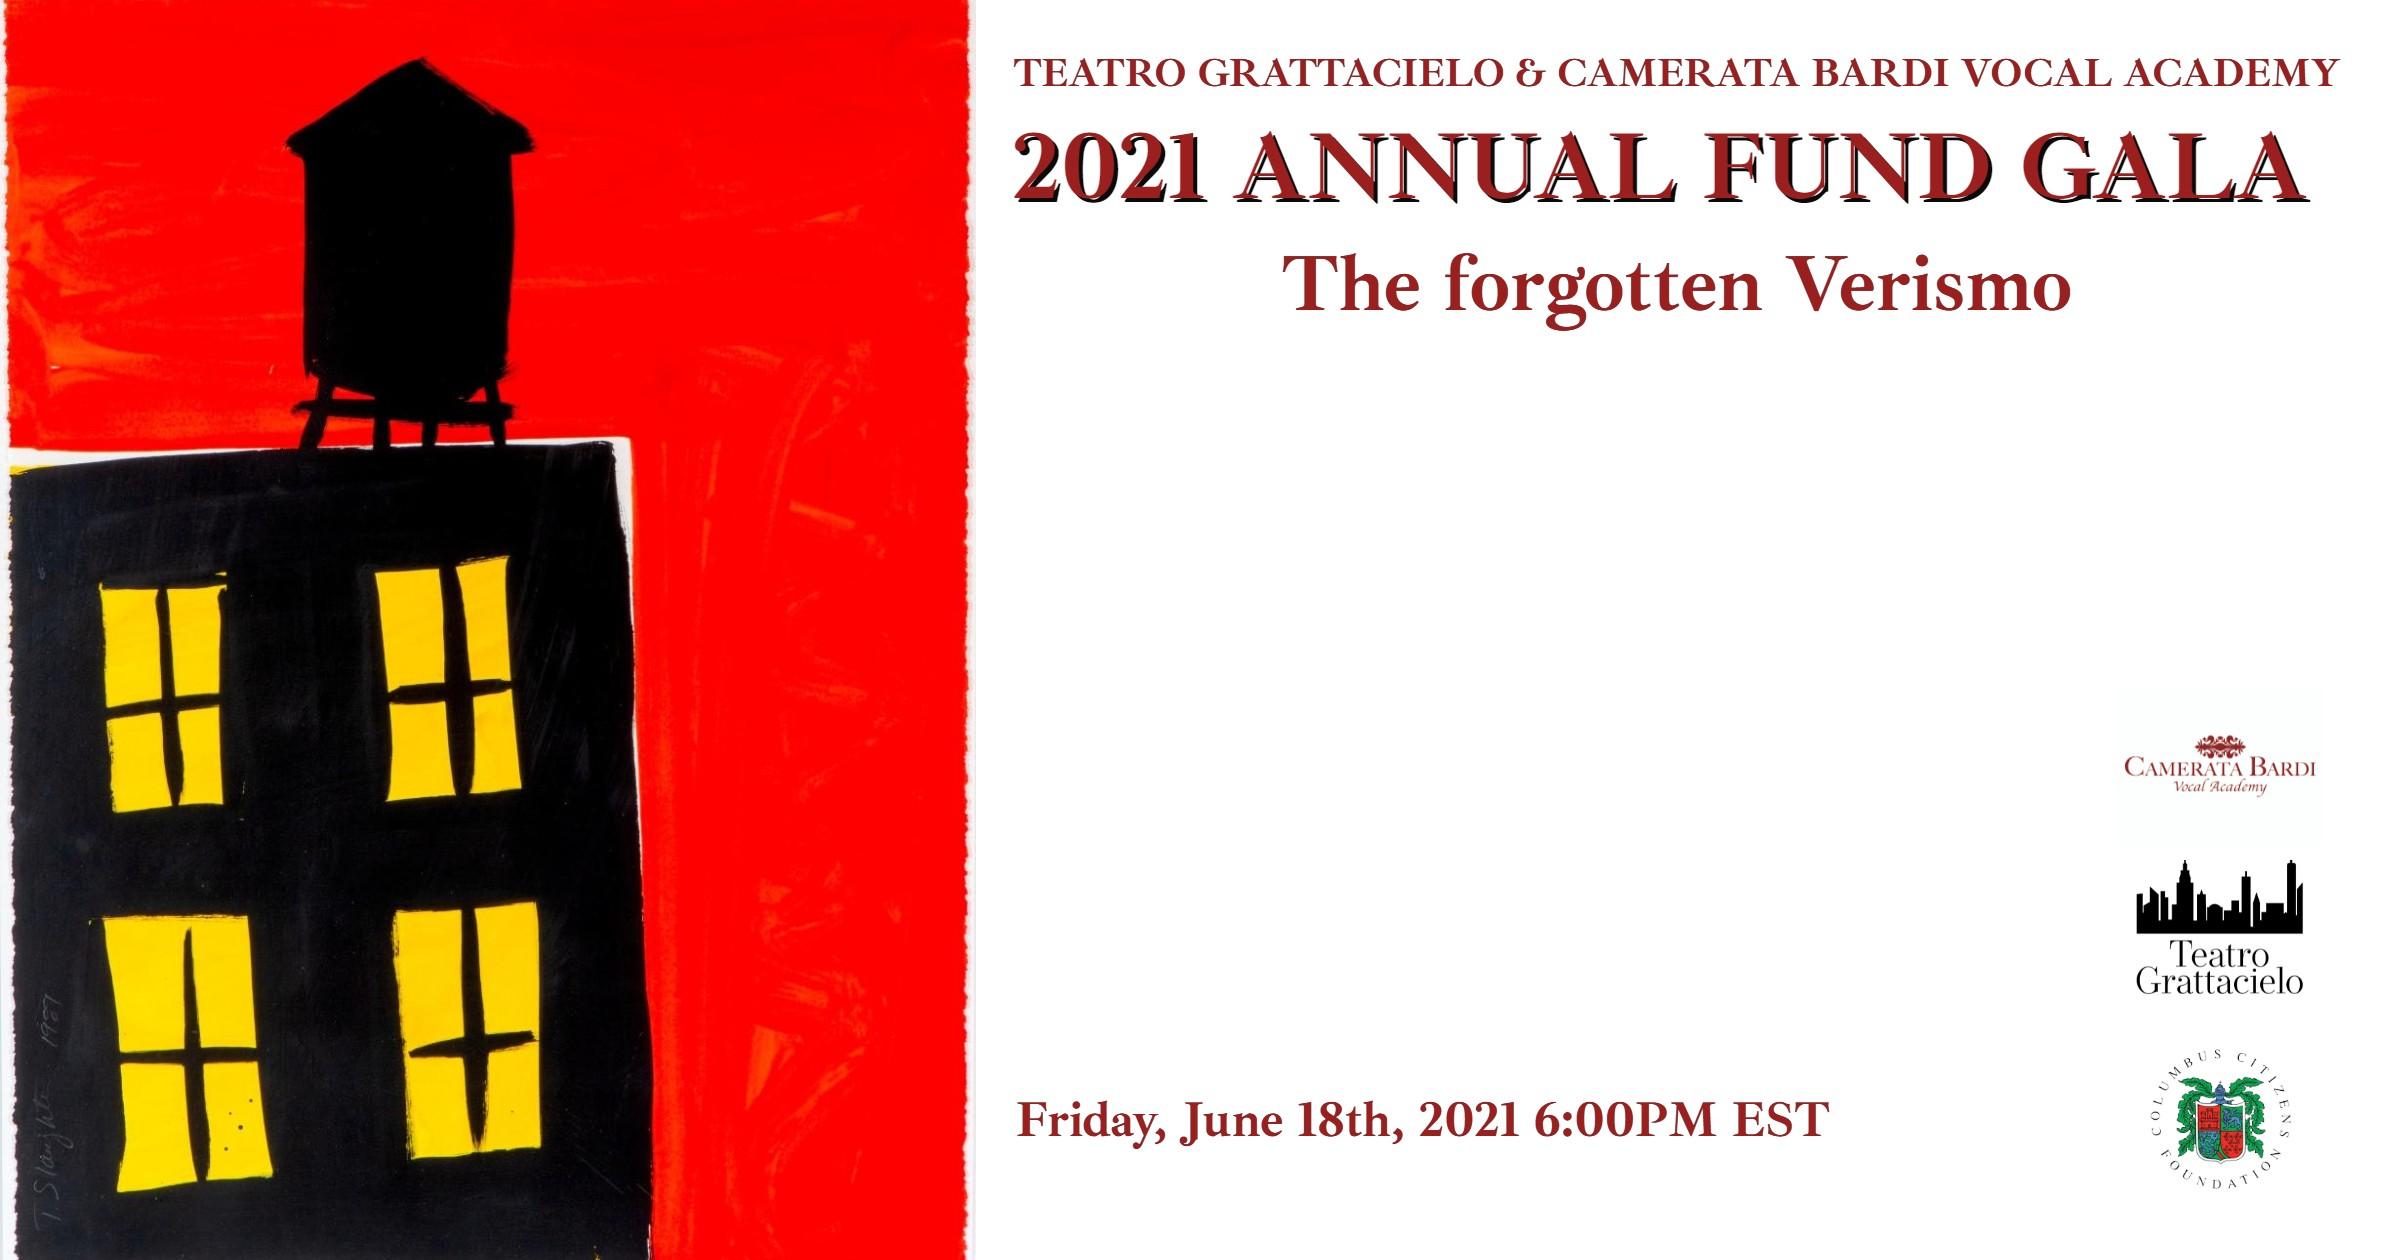 2021 ANNUAL FUND GALA | THE FORGOTTEN VERISMO